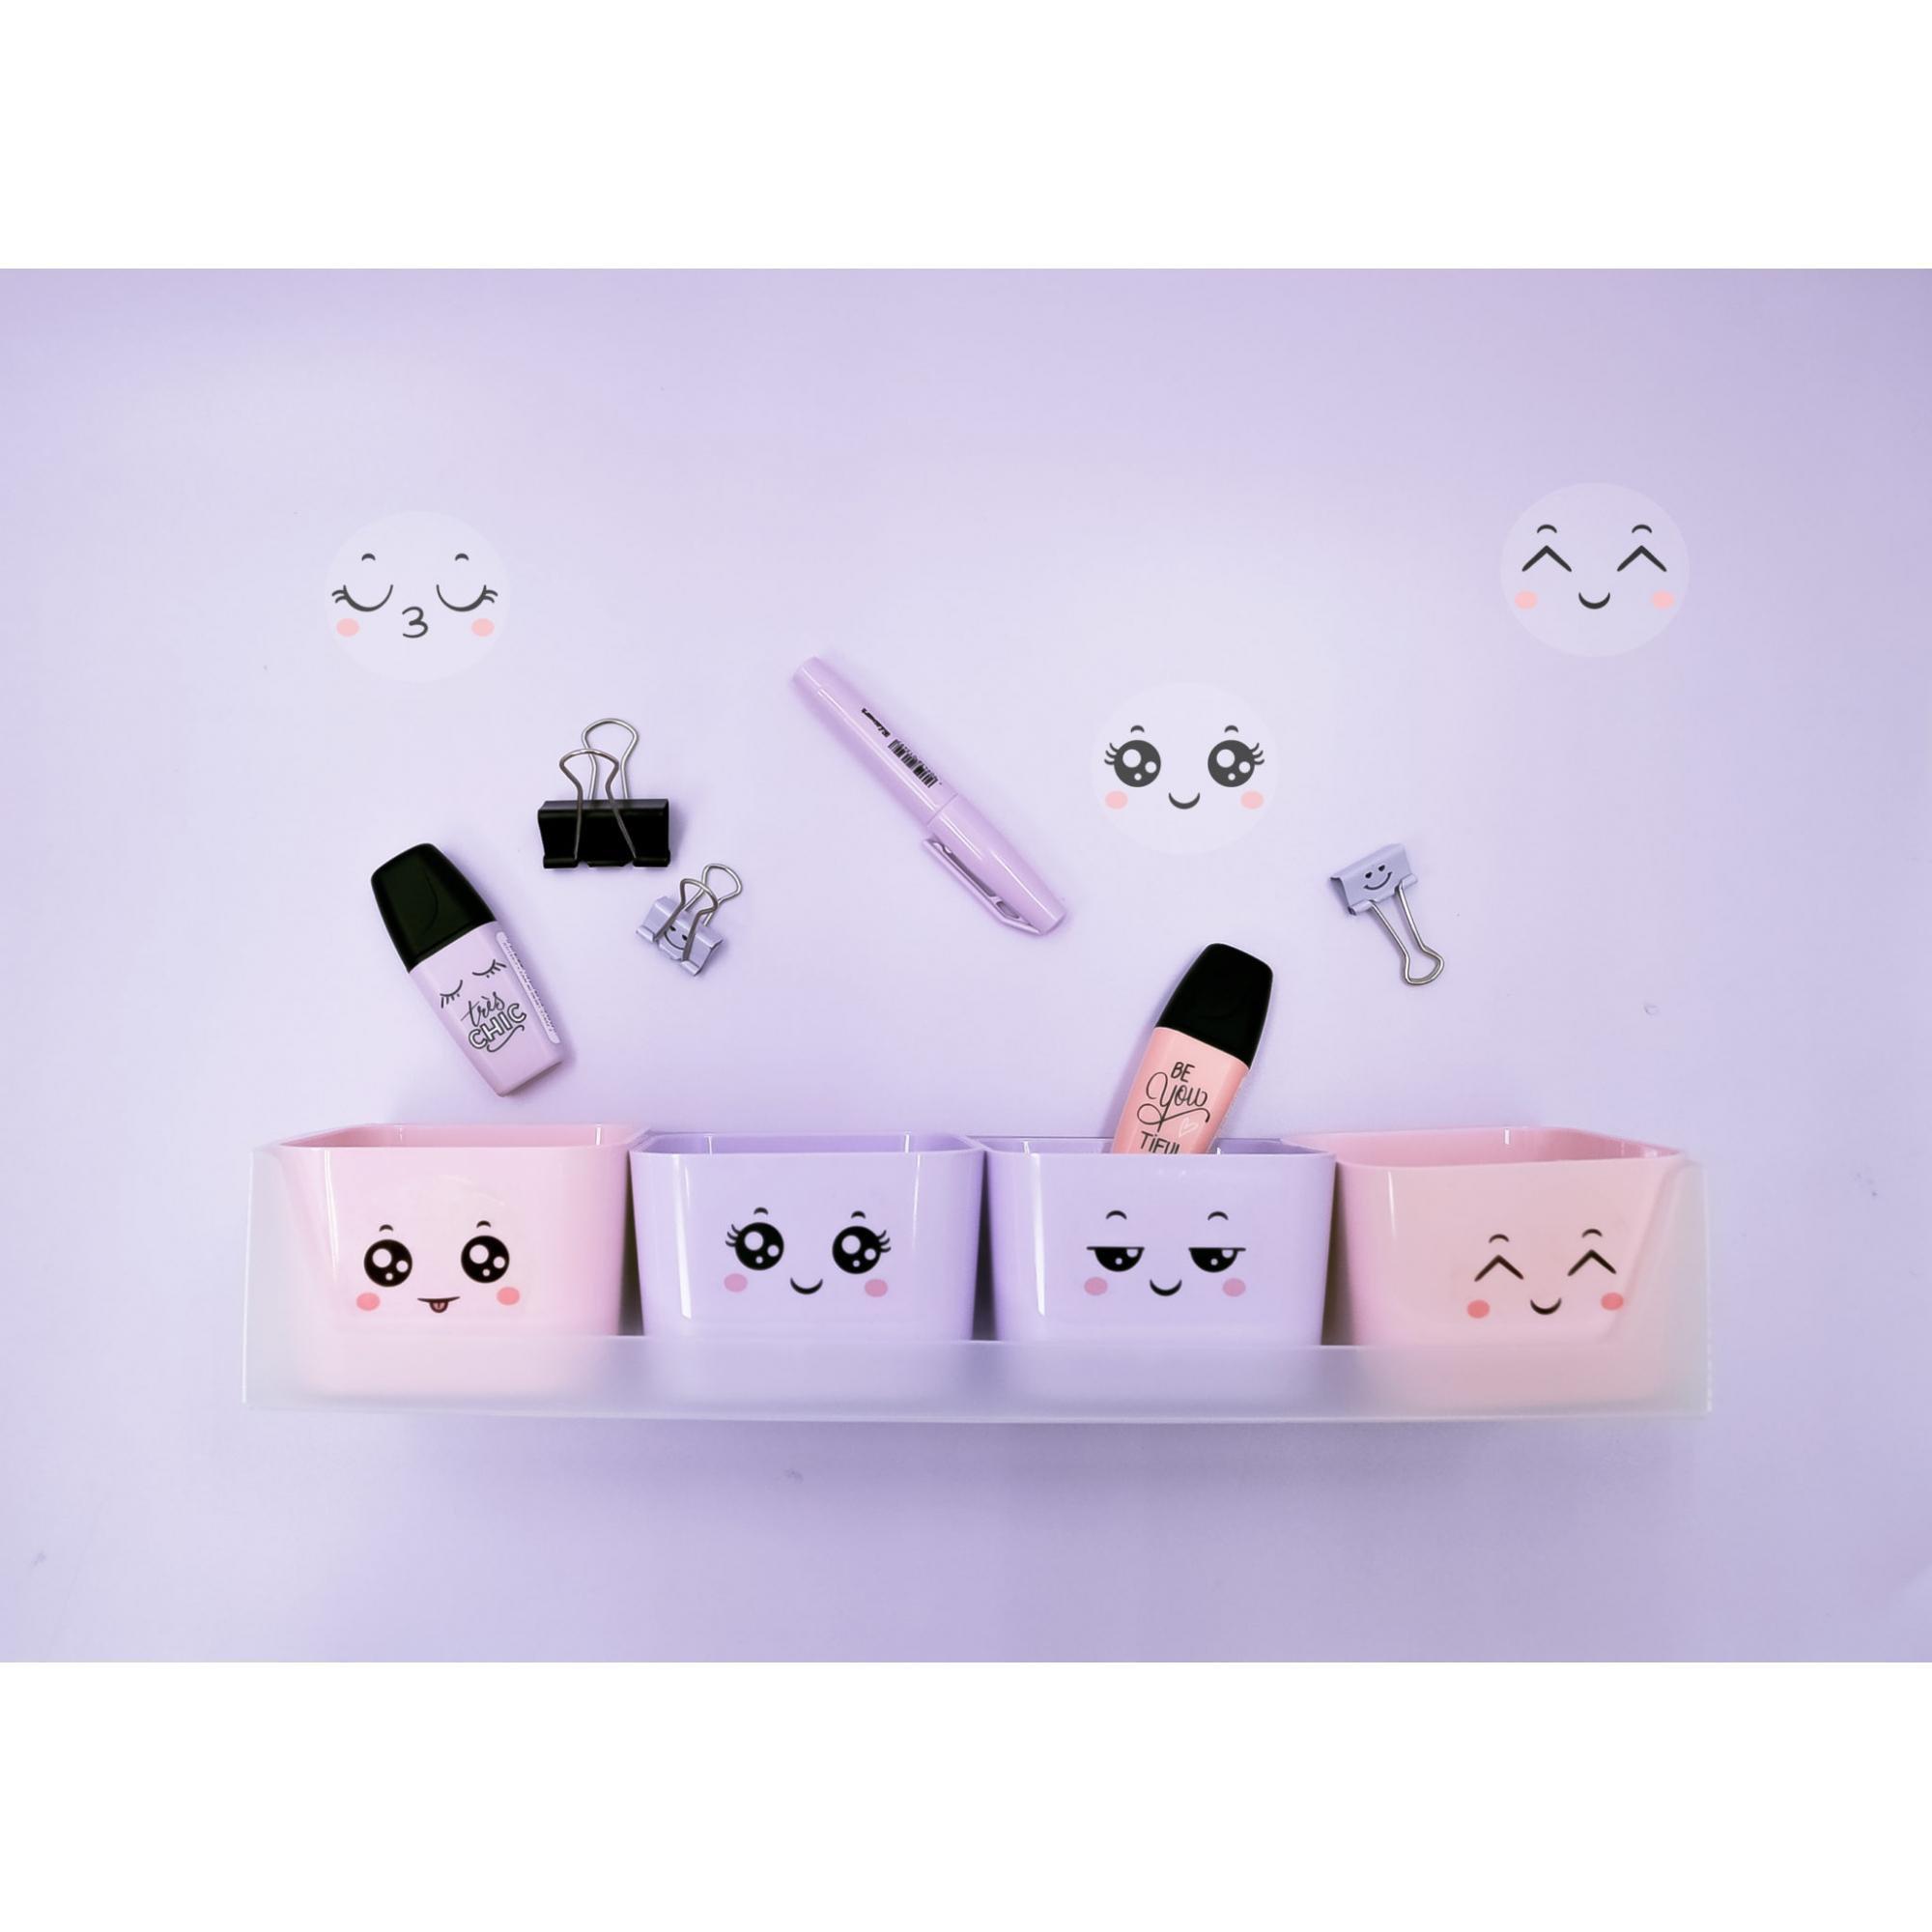 Mini Kit Doçura Com 4 Porta Objetos - Dello